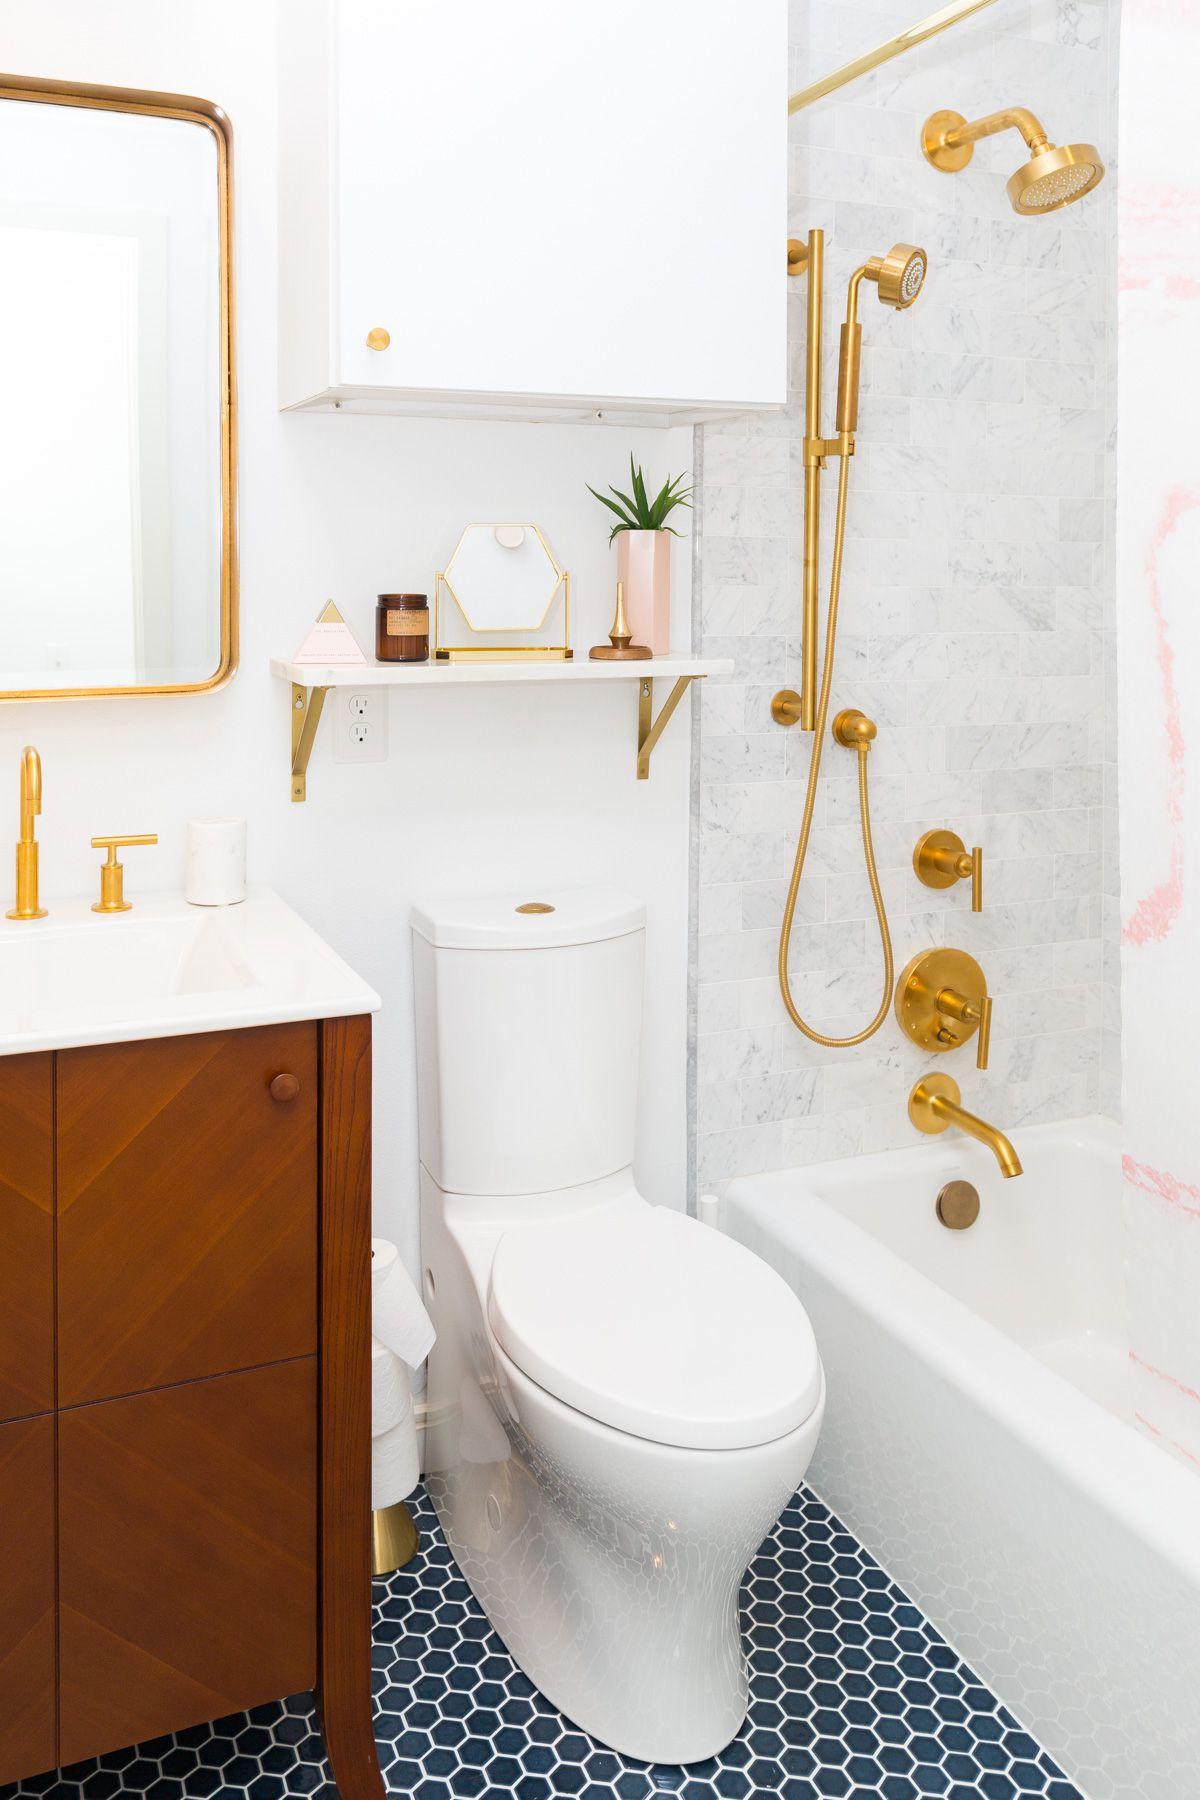 15 Small Bathroom Ideas to Ignite Your Remodel on Small Bathroom Renovation Ideas  id=66556